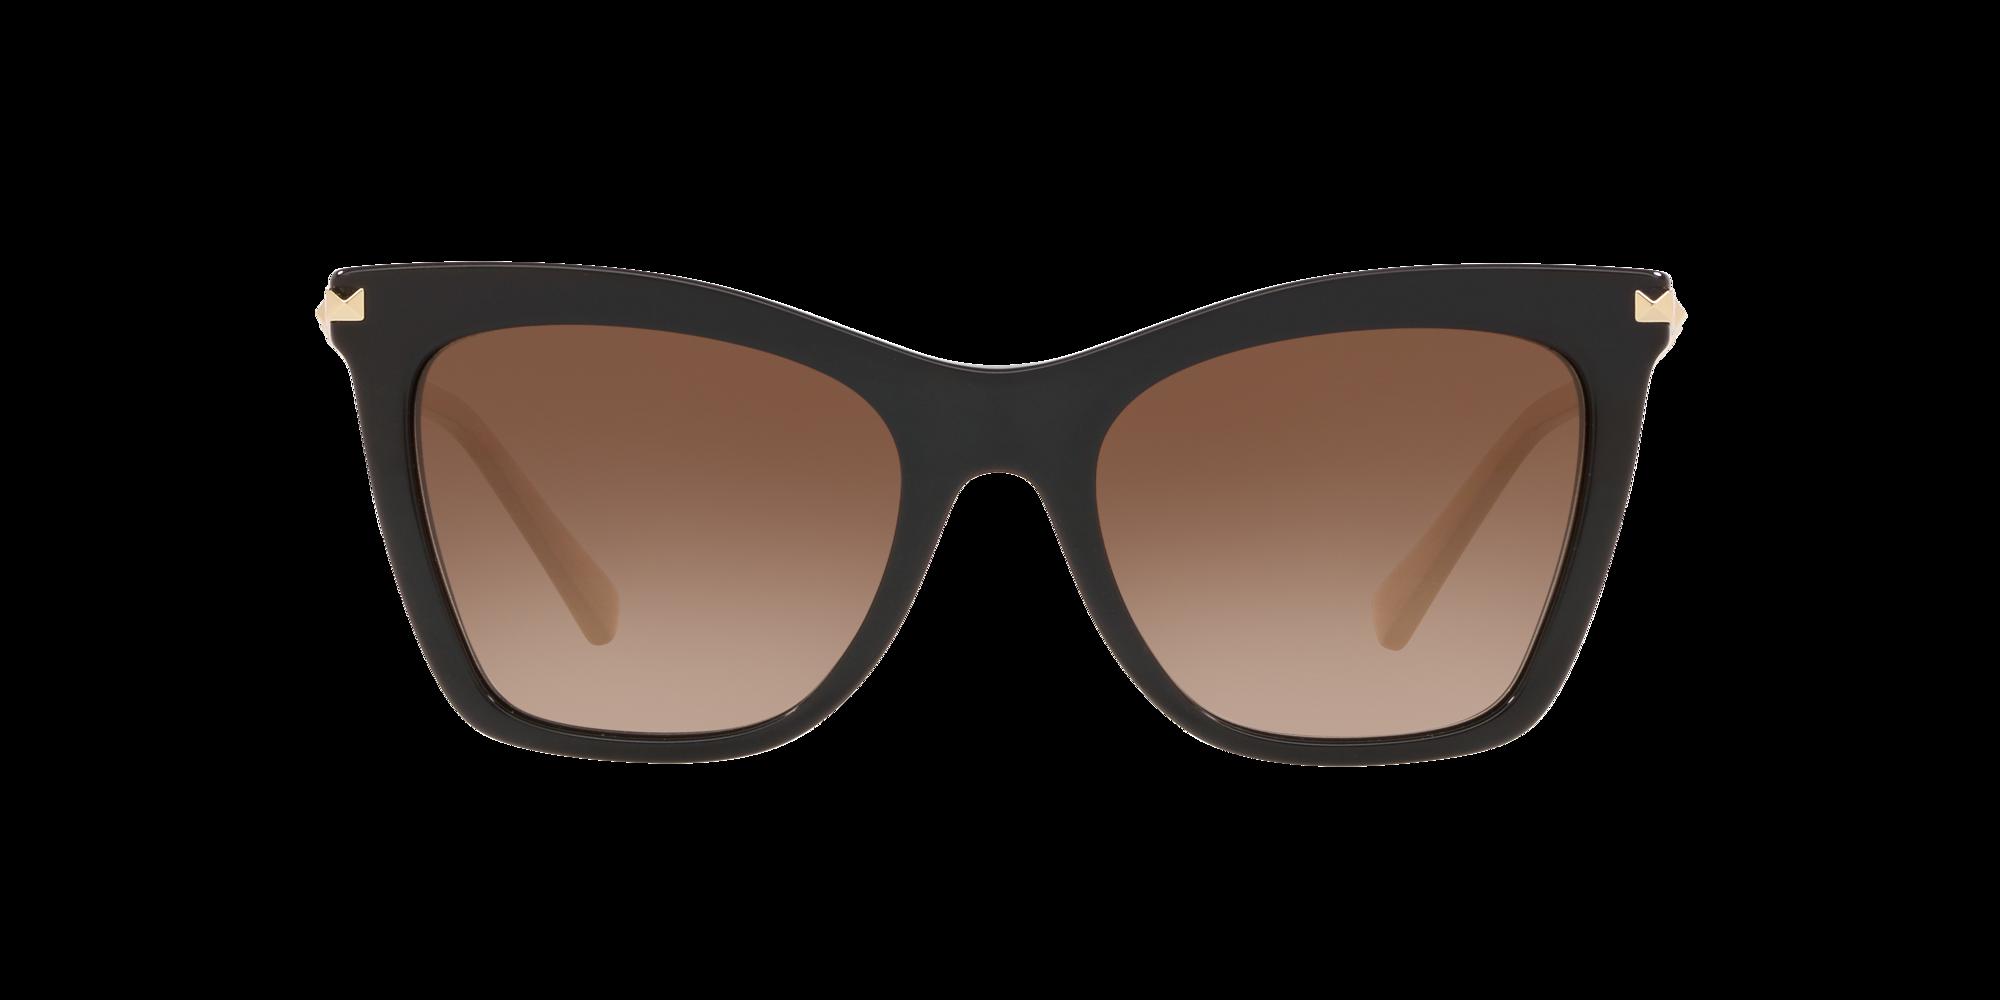 Image for VA4061 54 from LensCrafters | Glasses, Prescription Glasses Online, Eyewear